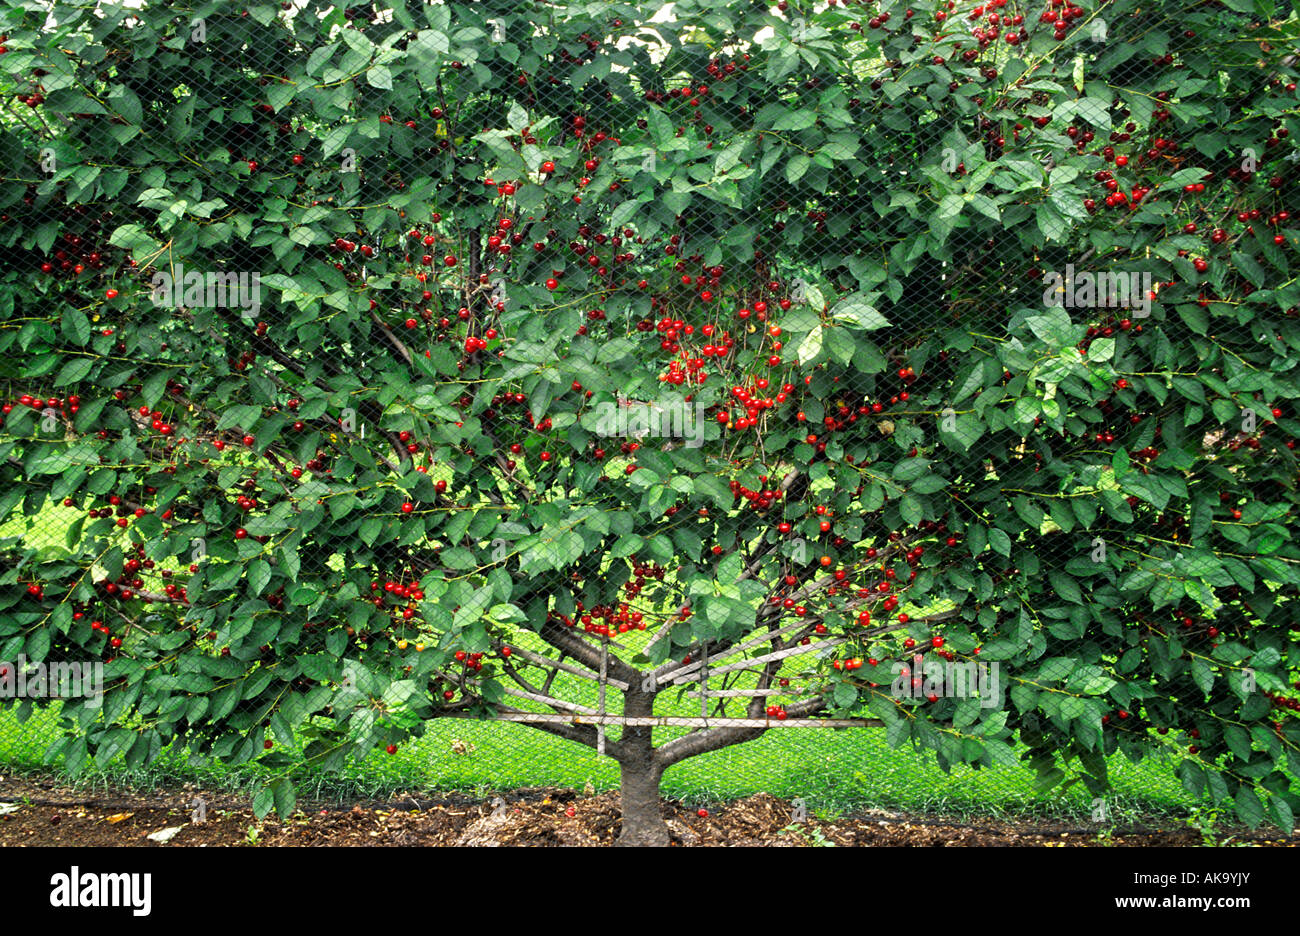 fan trained Morello cherry under mesh - Stock Image